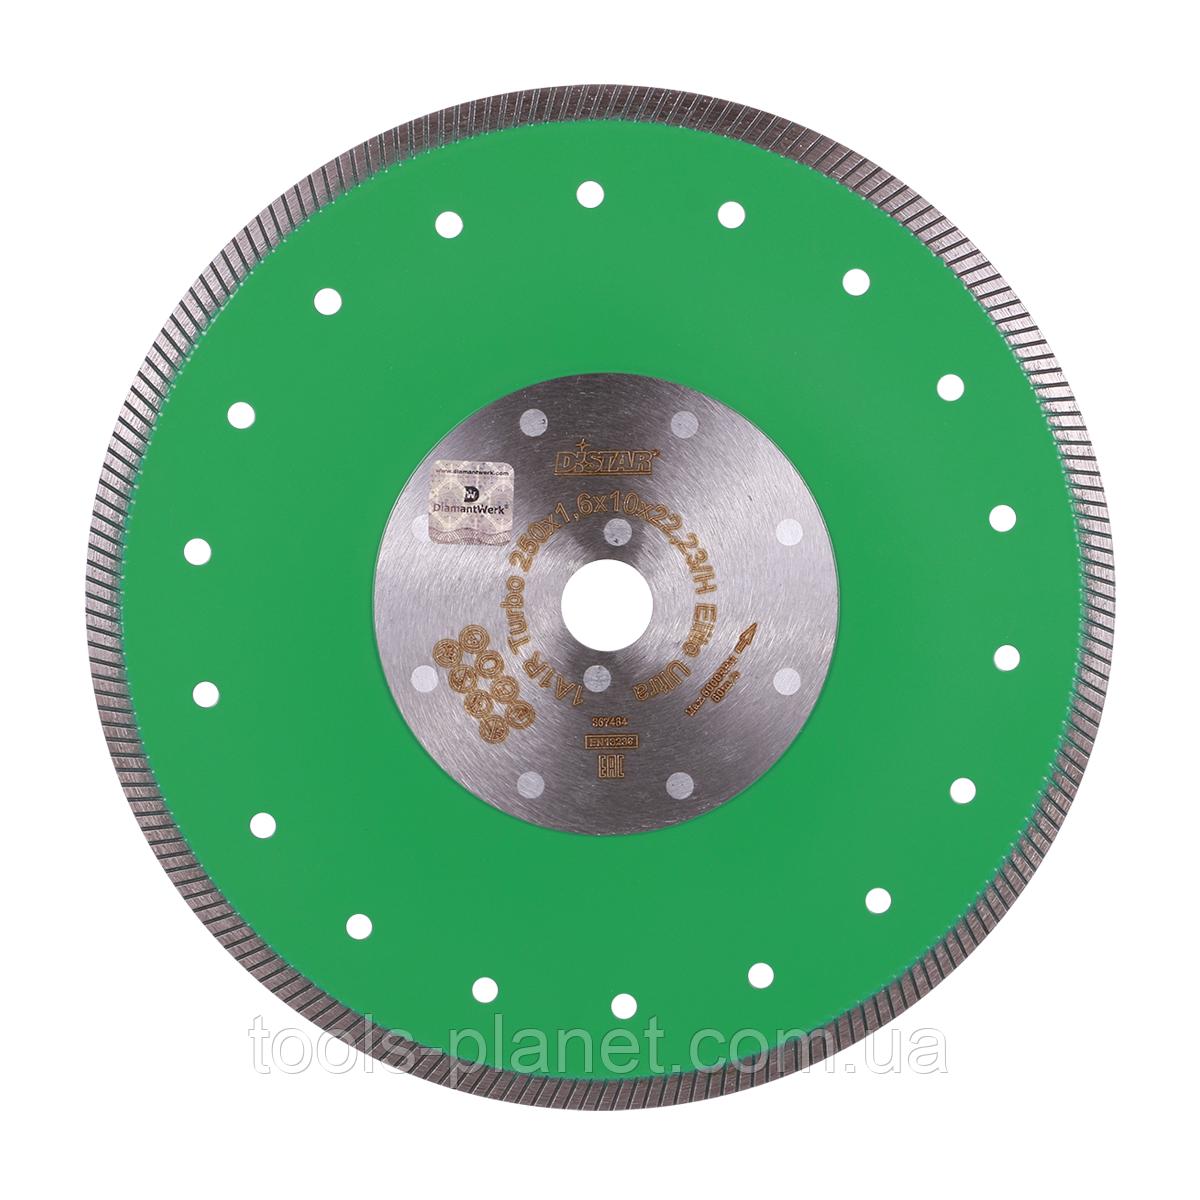 Алмазный диск Distar 1A1R Turbo 200 x 1,6 x 8,5 x 22,23 / H Elite Ultra 5D (10115024015)